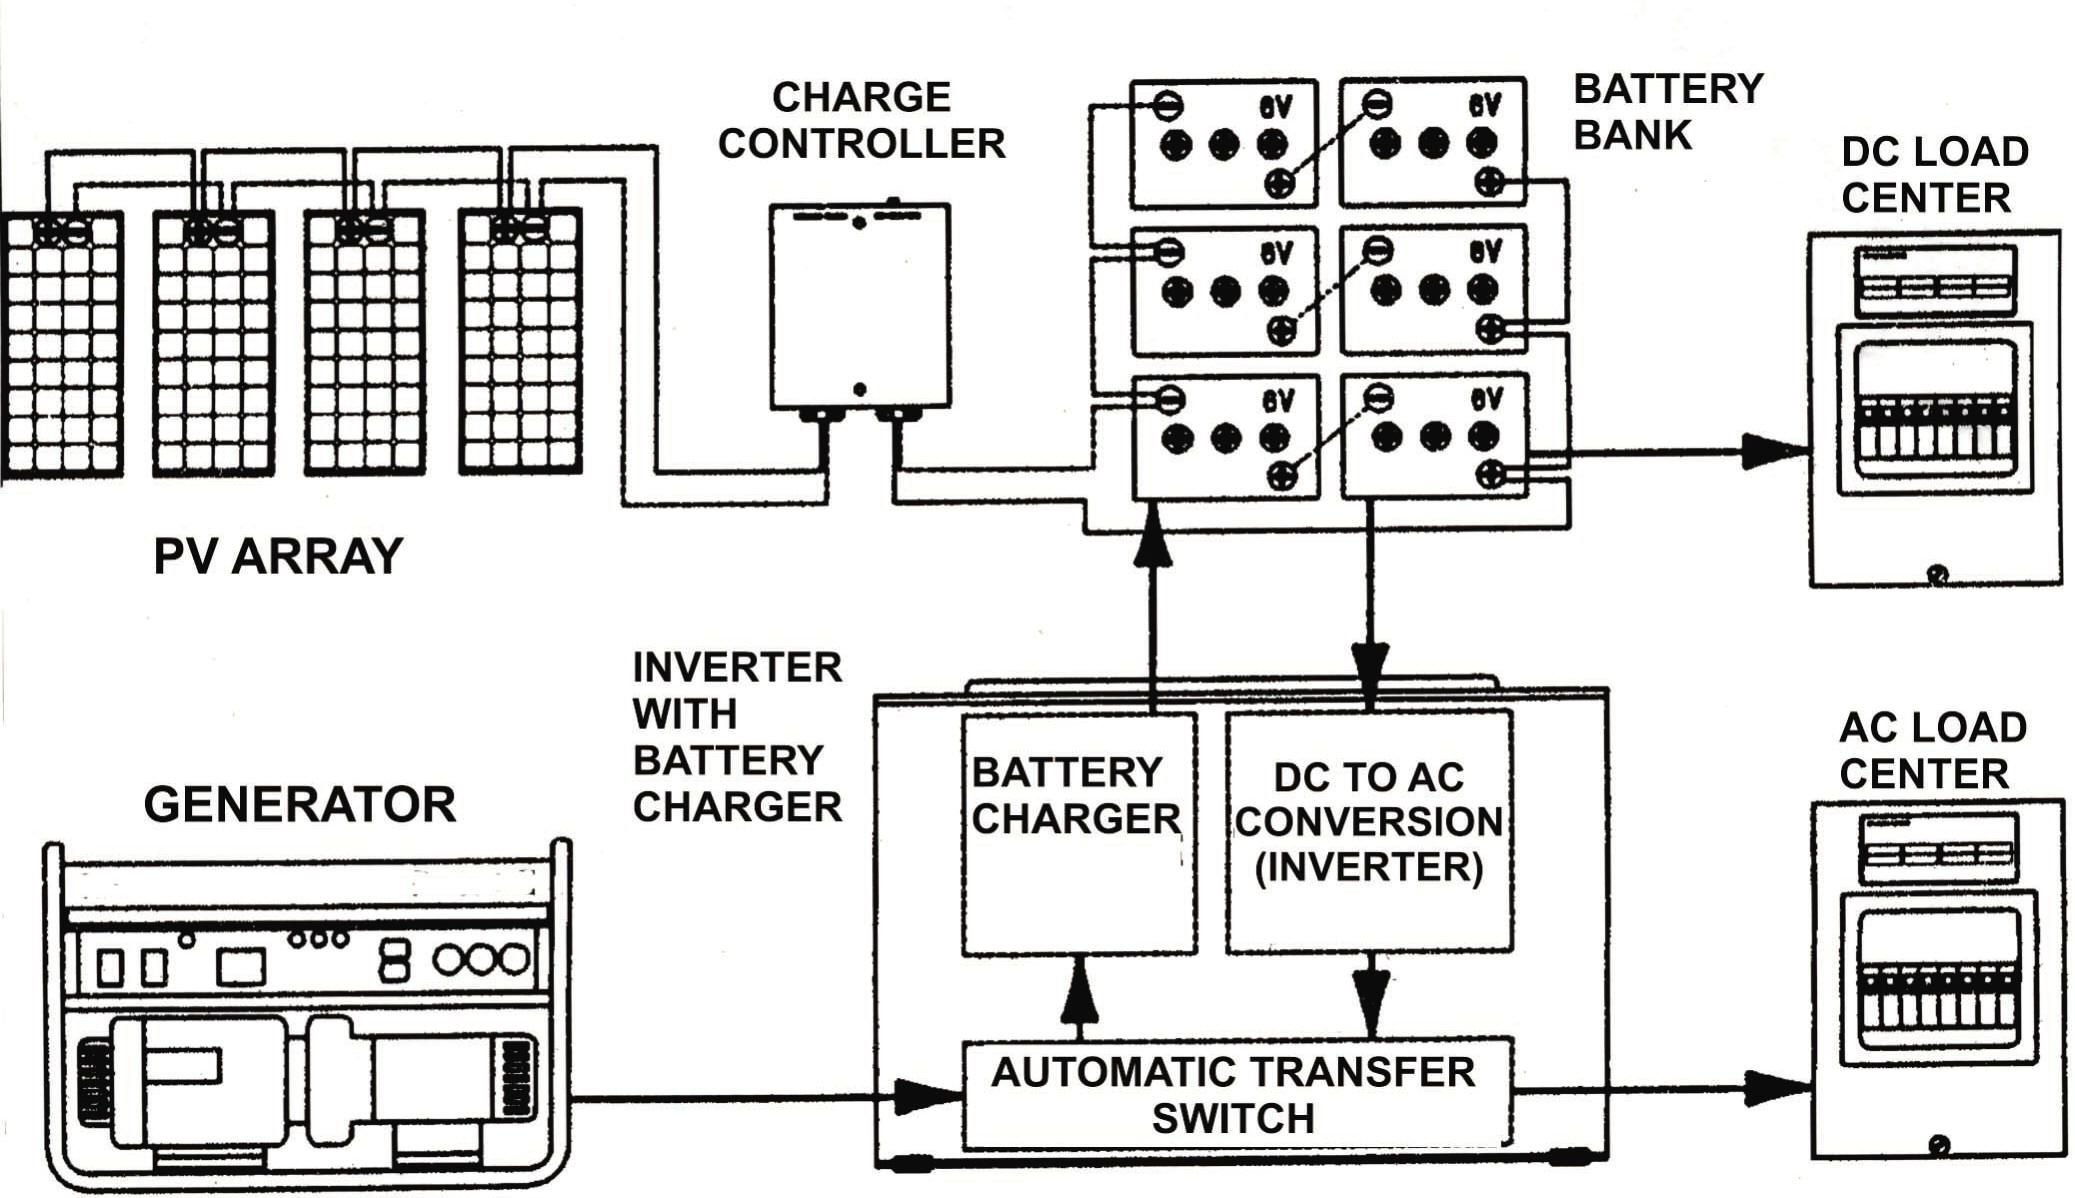 off grid solar generator wiring diagram simple wiring schema home generator wiring diagram off grid solar [ 2075 x 1198 Pixel ]